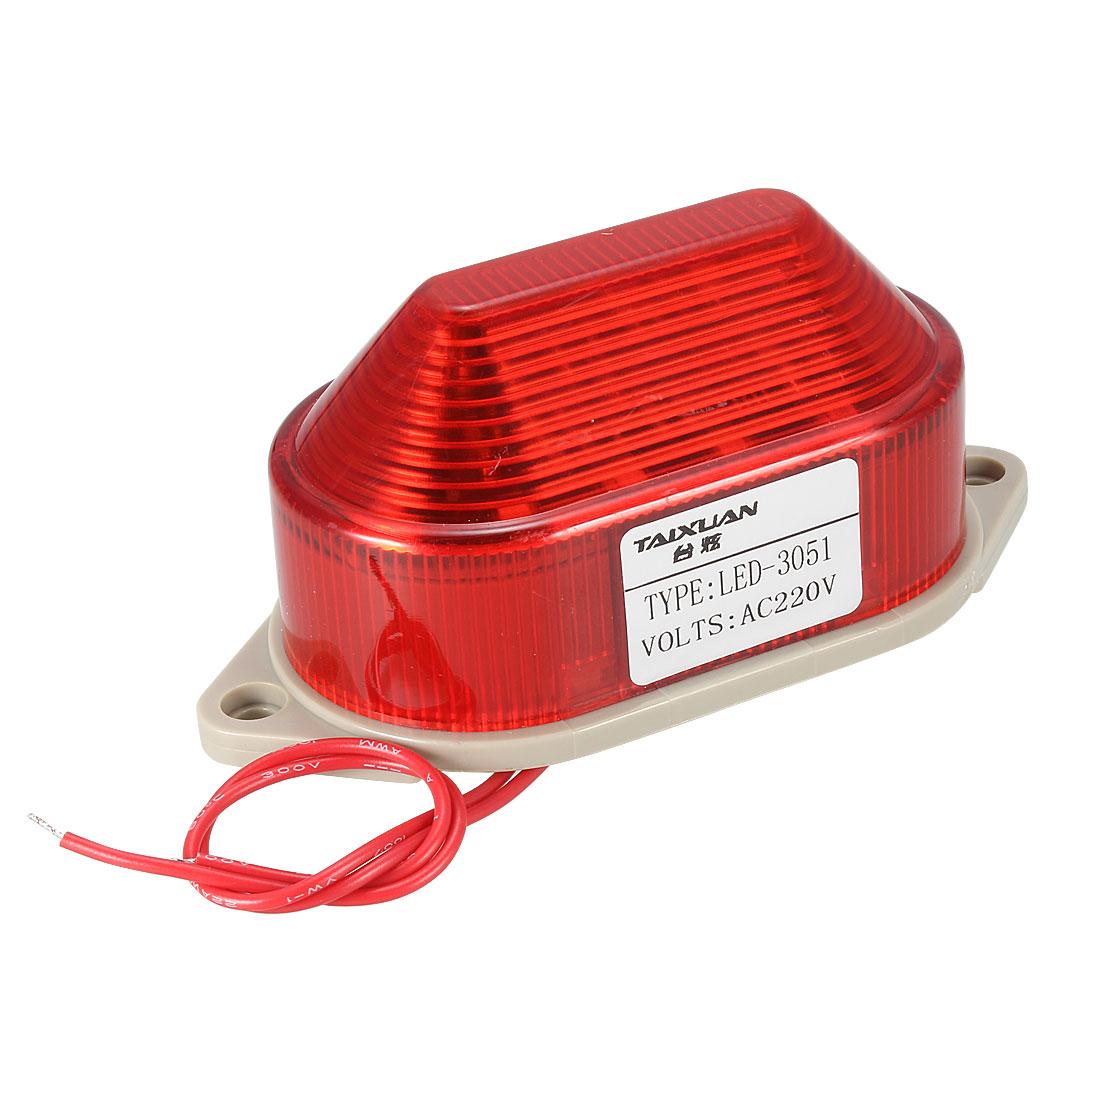 AC 220V 3W School Industrial Emergency Red Flash Warning Light Lamp